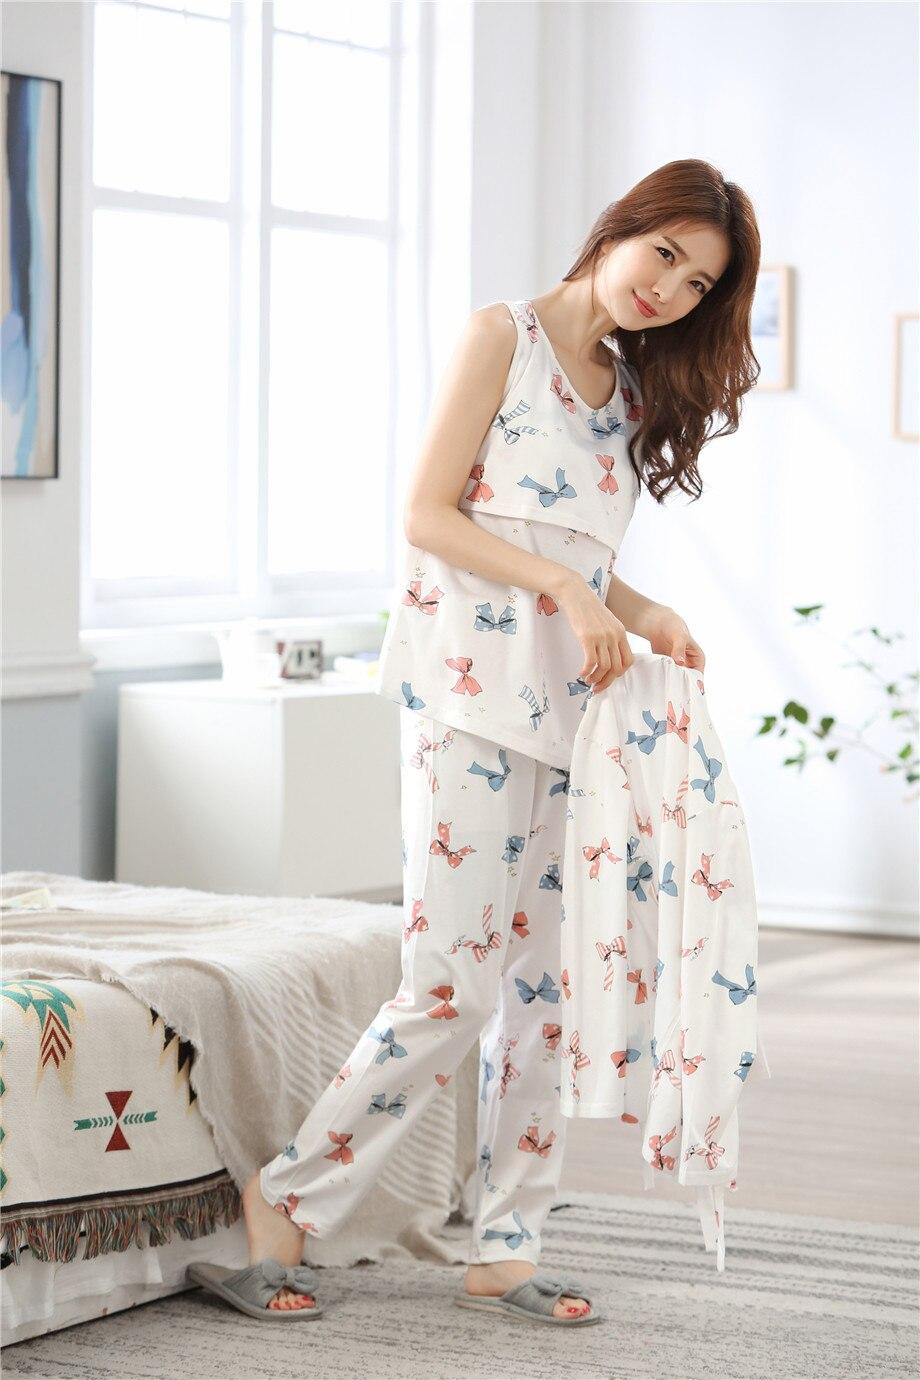 3 PCs/Set Printed Maternity Nursing Sleepwear Breastfeeding Nightwear for Pregnant Women Pregnancy Breast Feeding Pajamas Suits enlarge